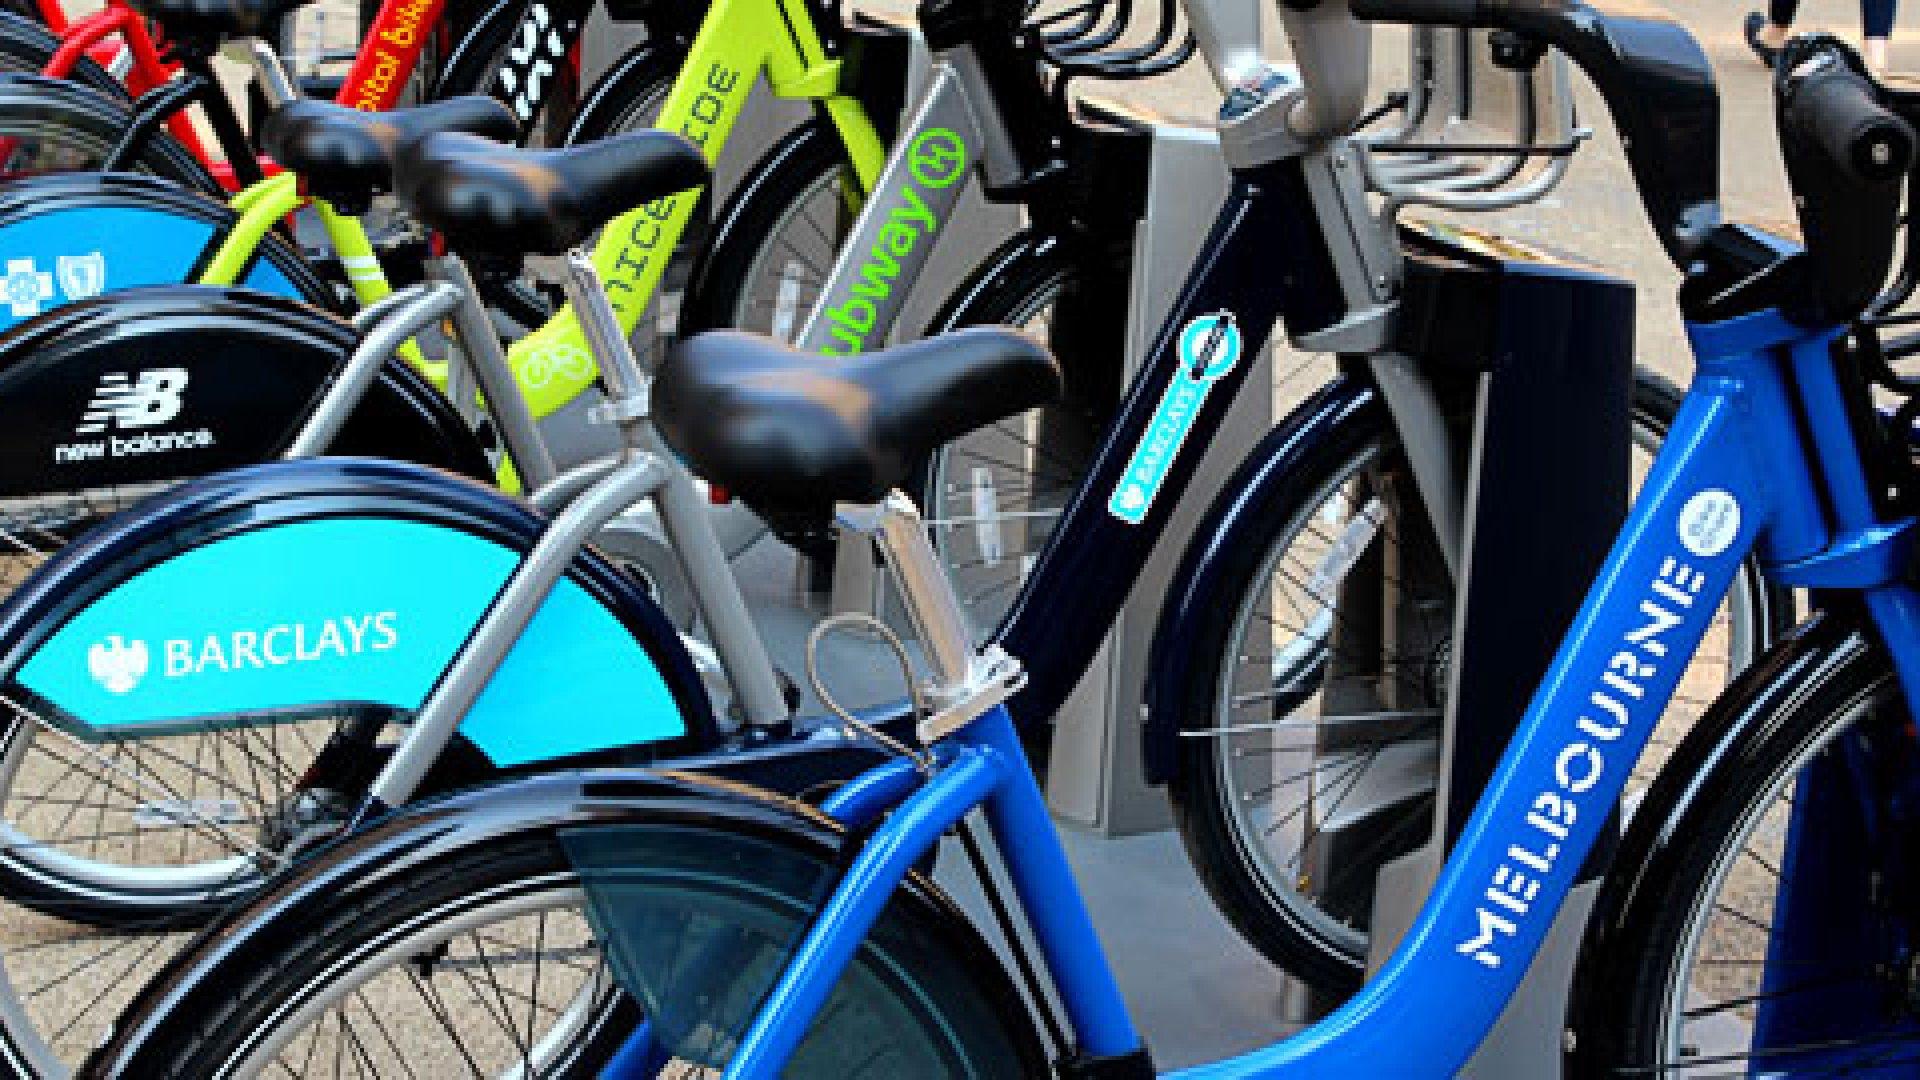 Big Idea: City Bikes by Subscription